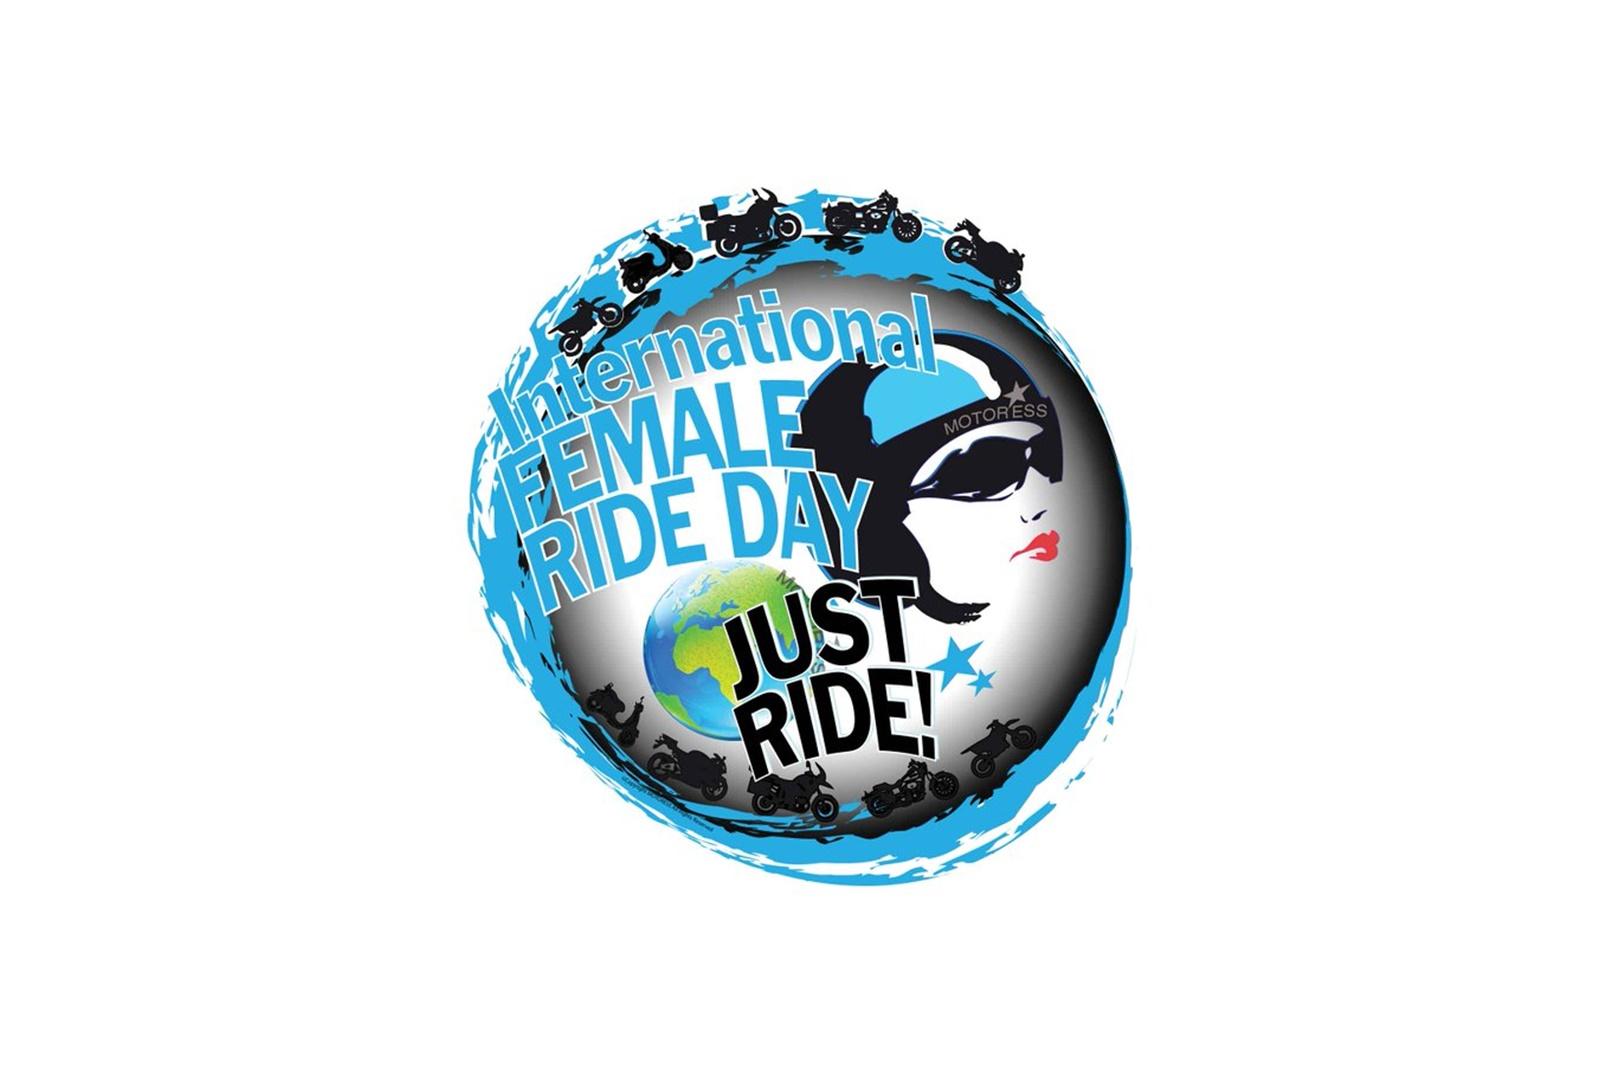 Hoy es el International Female Ride Day, así que si eres mujer… ¡sal a rodar!